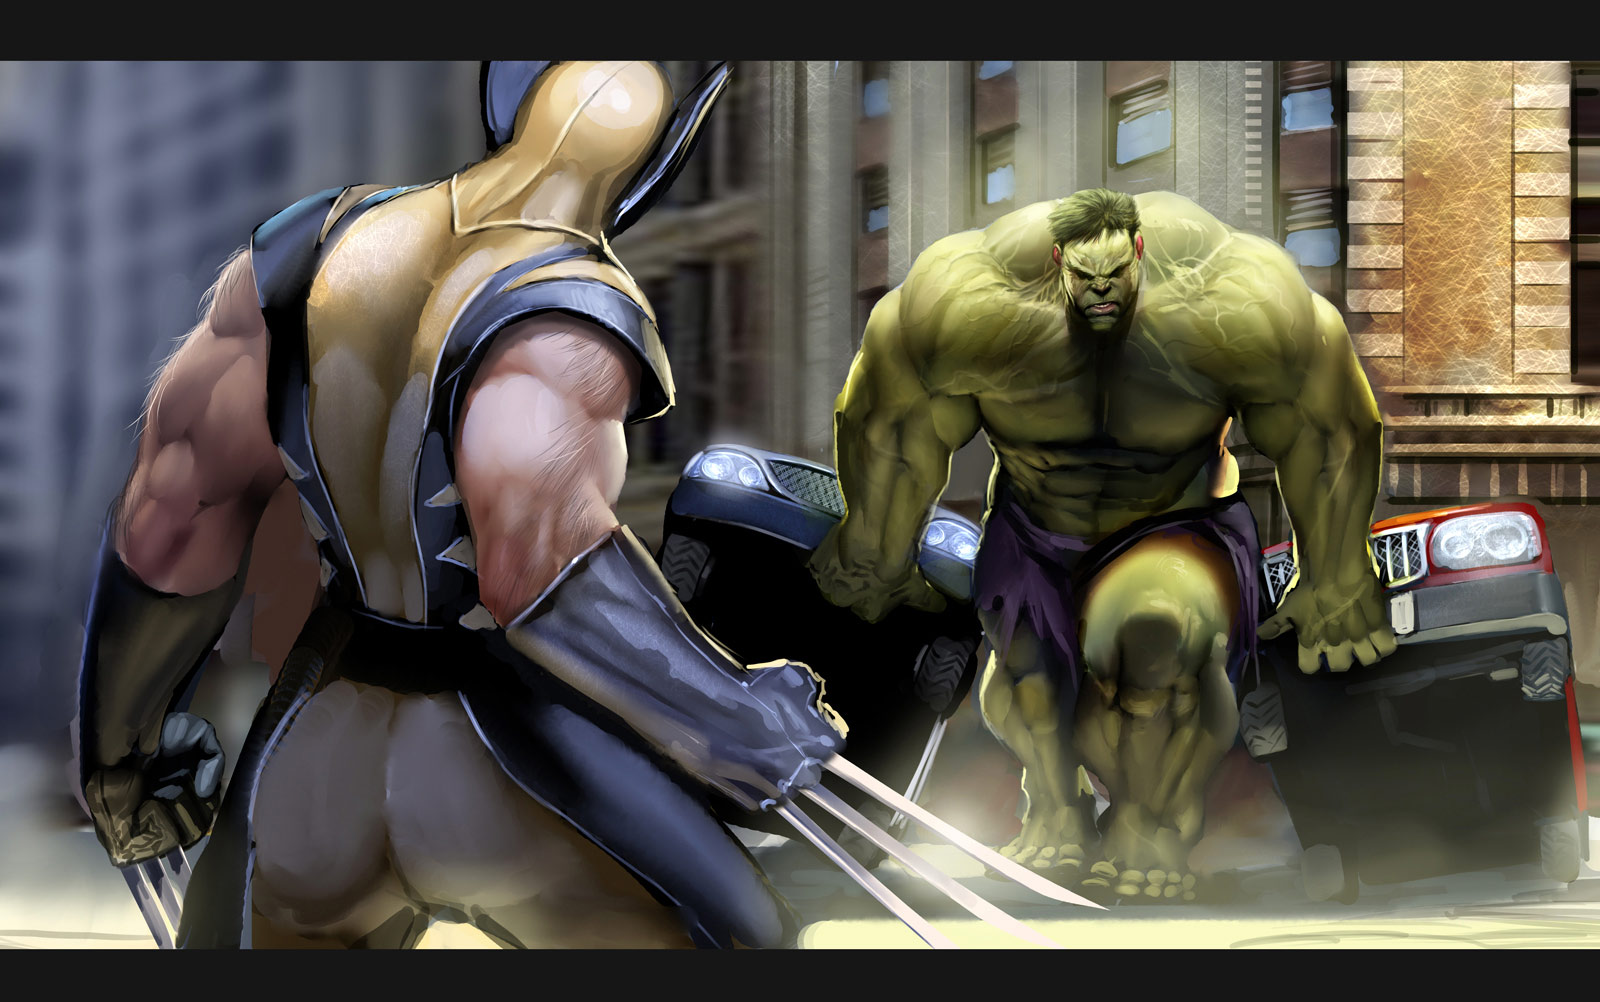 Wolverine vs hulk comic wallpaper